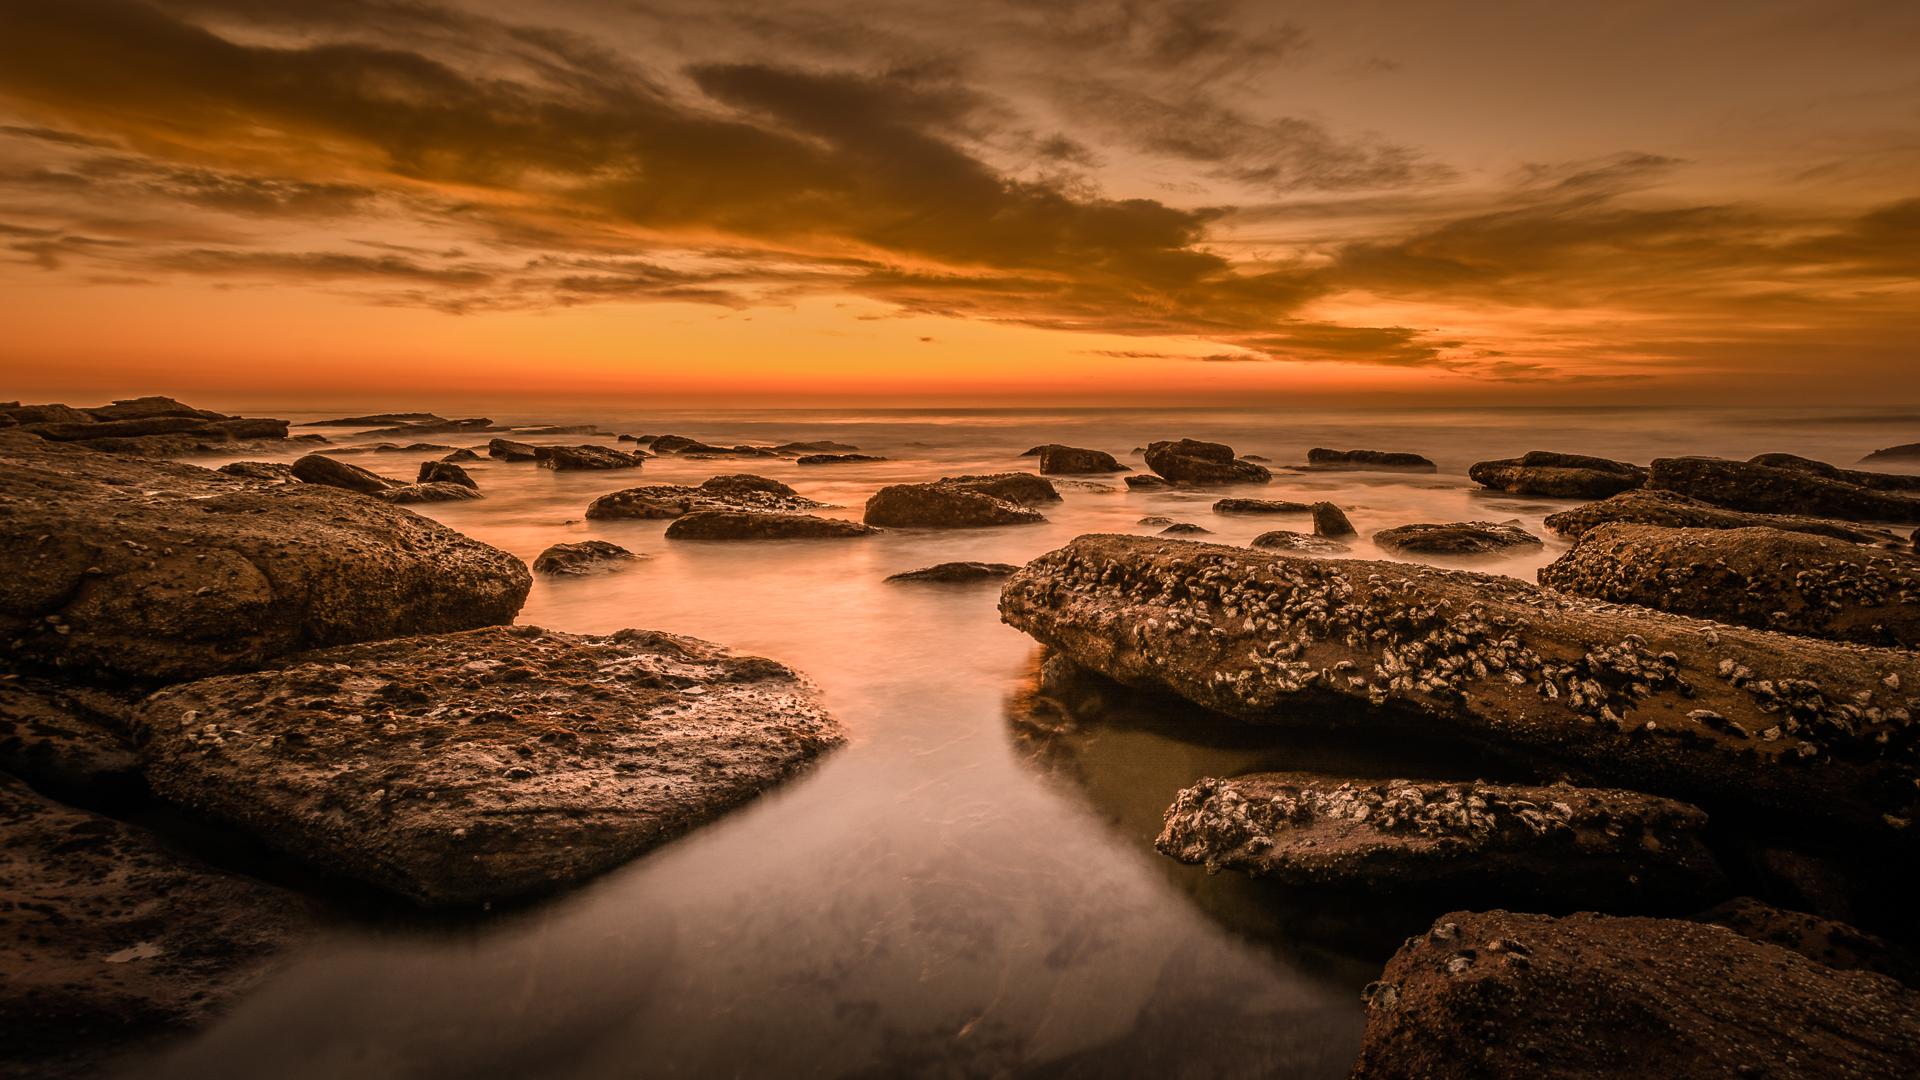 Shelly beach sunrise